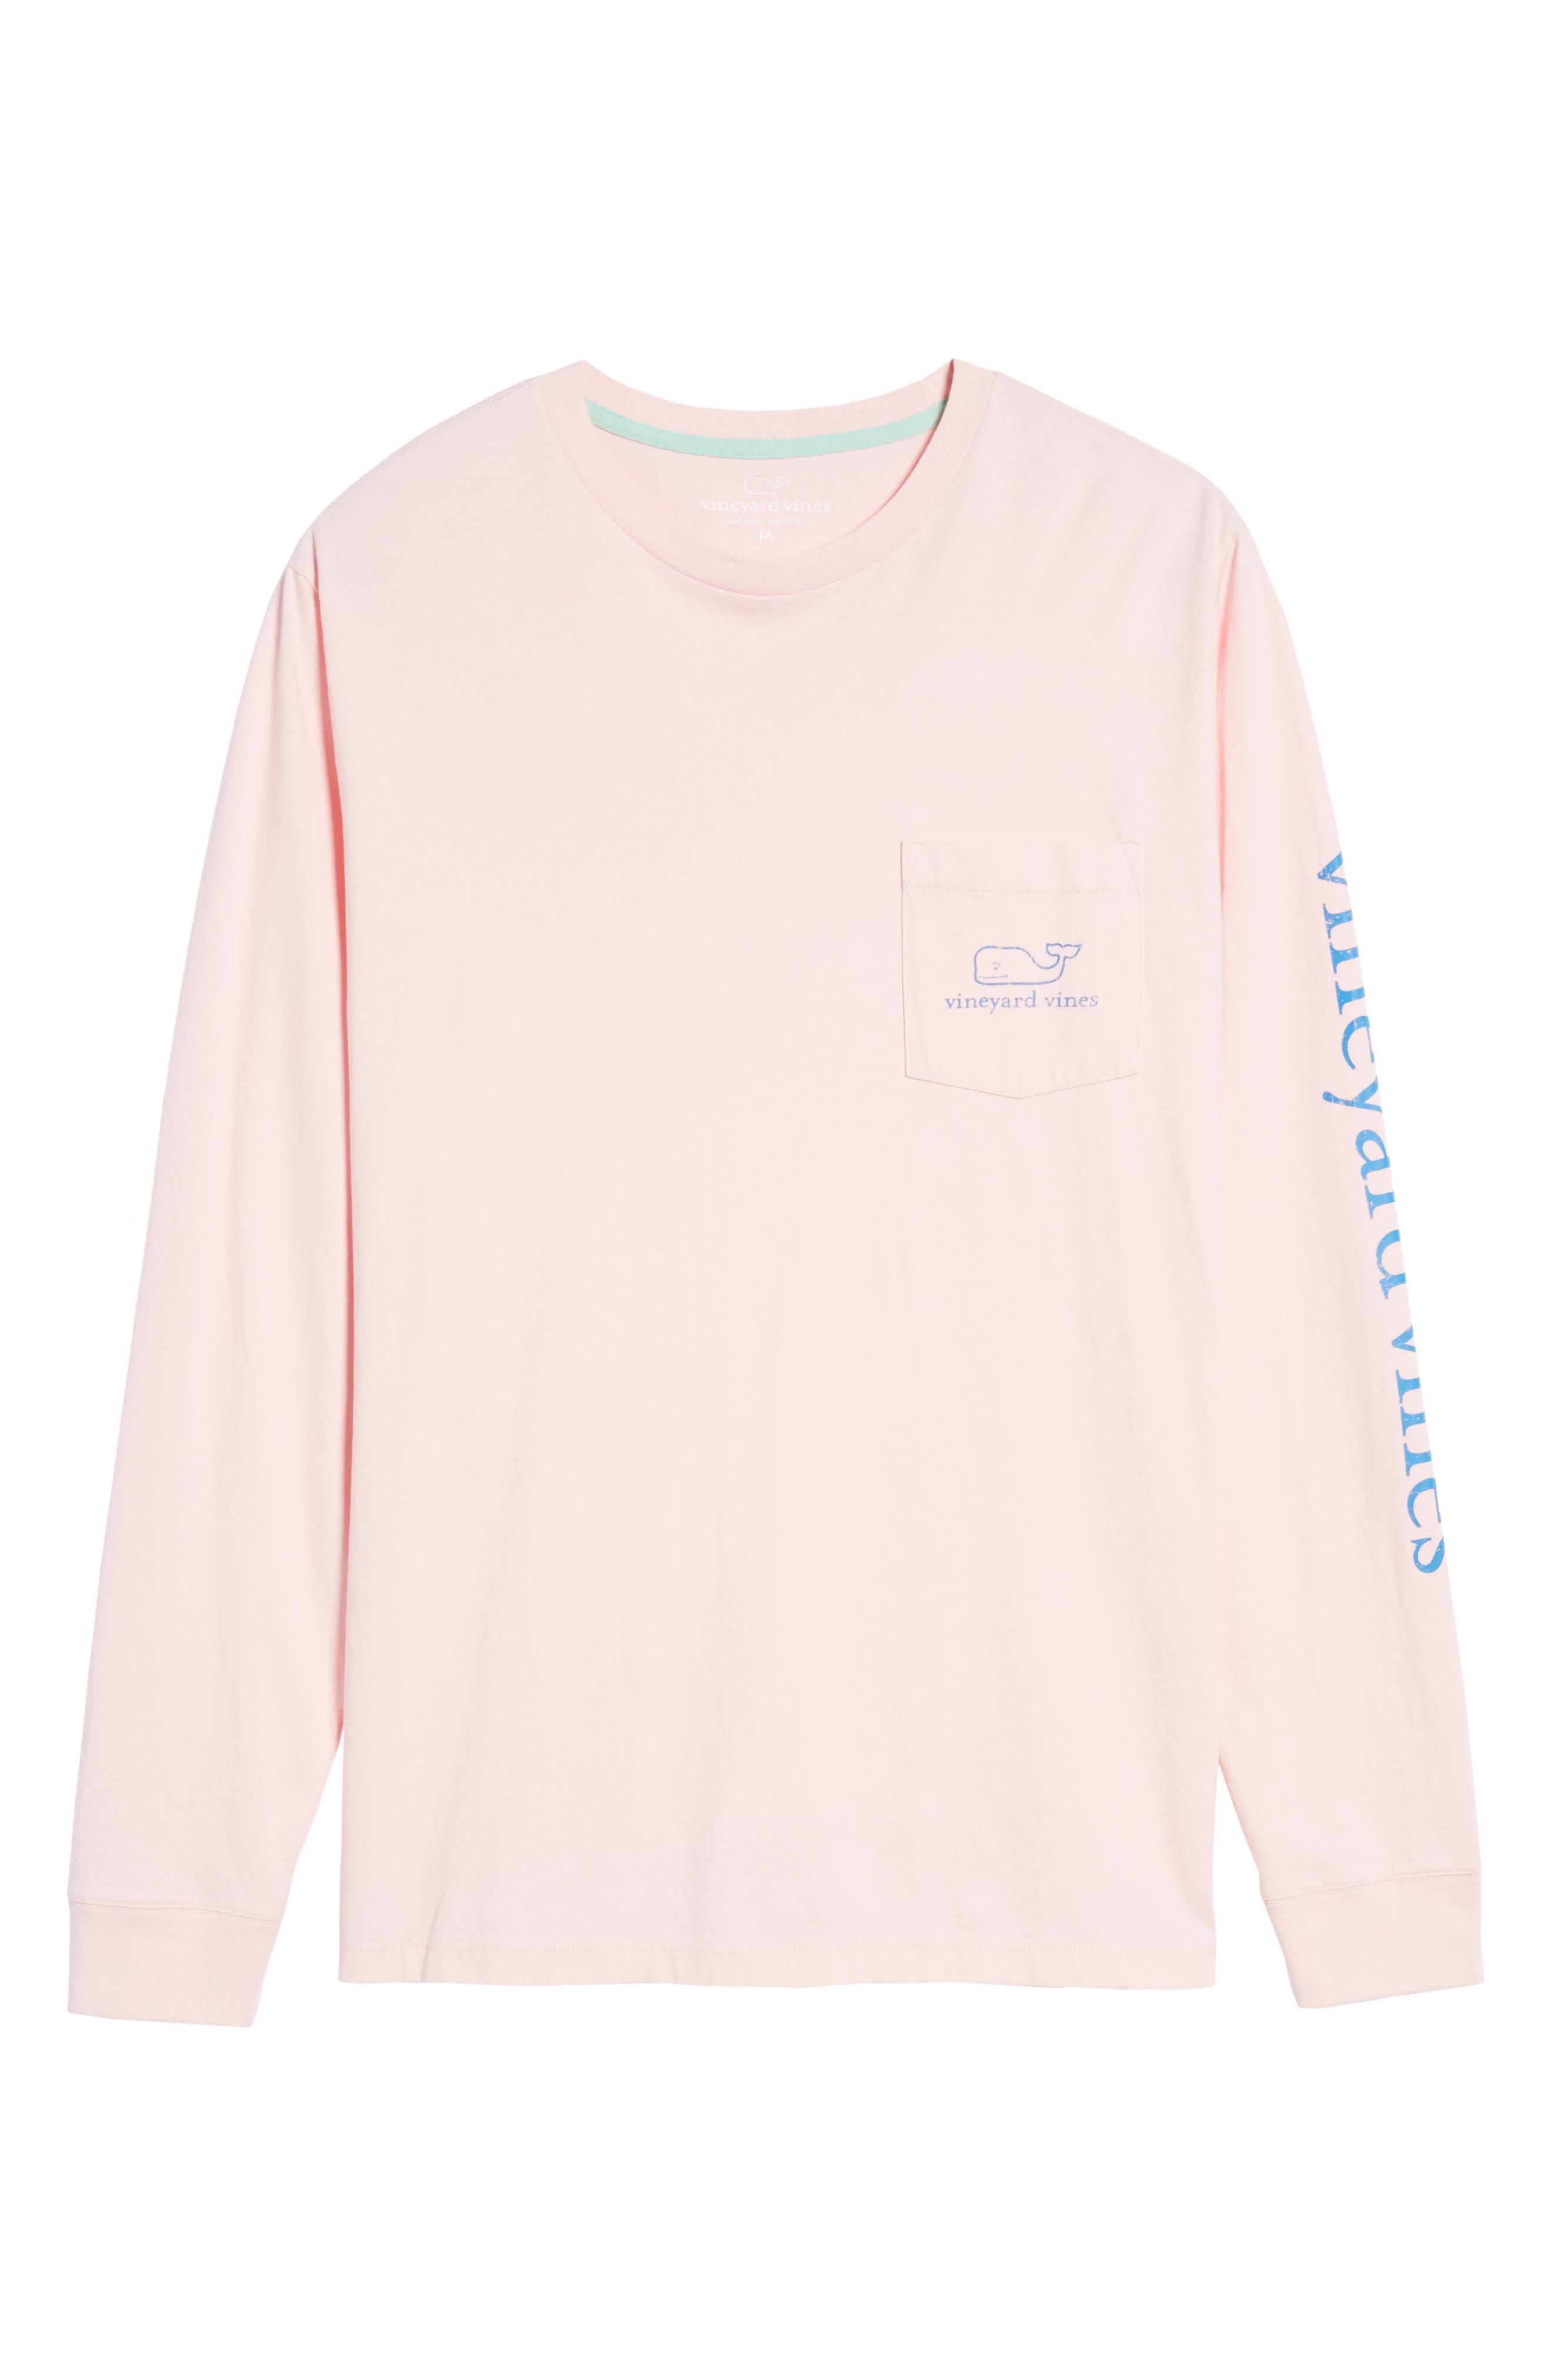 Vineyard Vines Pocket Long Sleeve T-Shirt